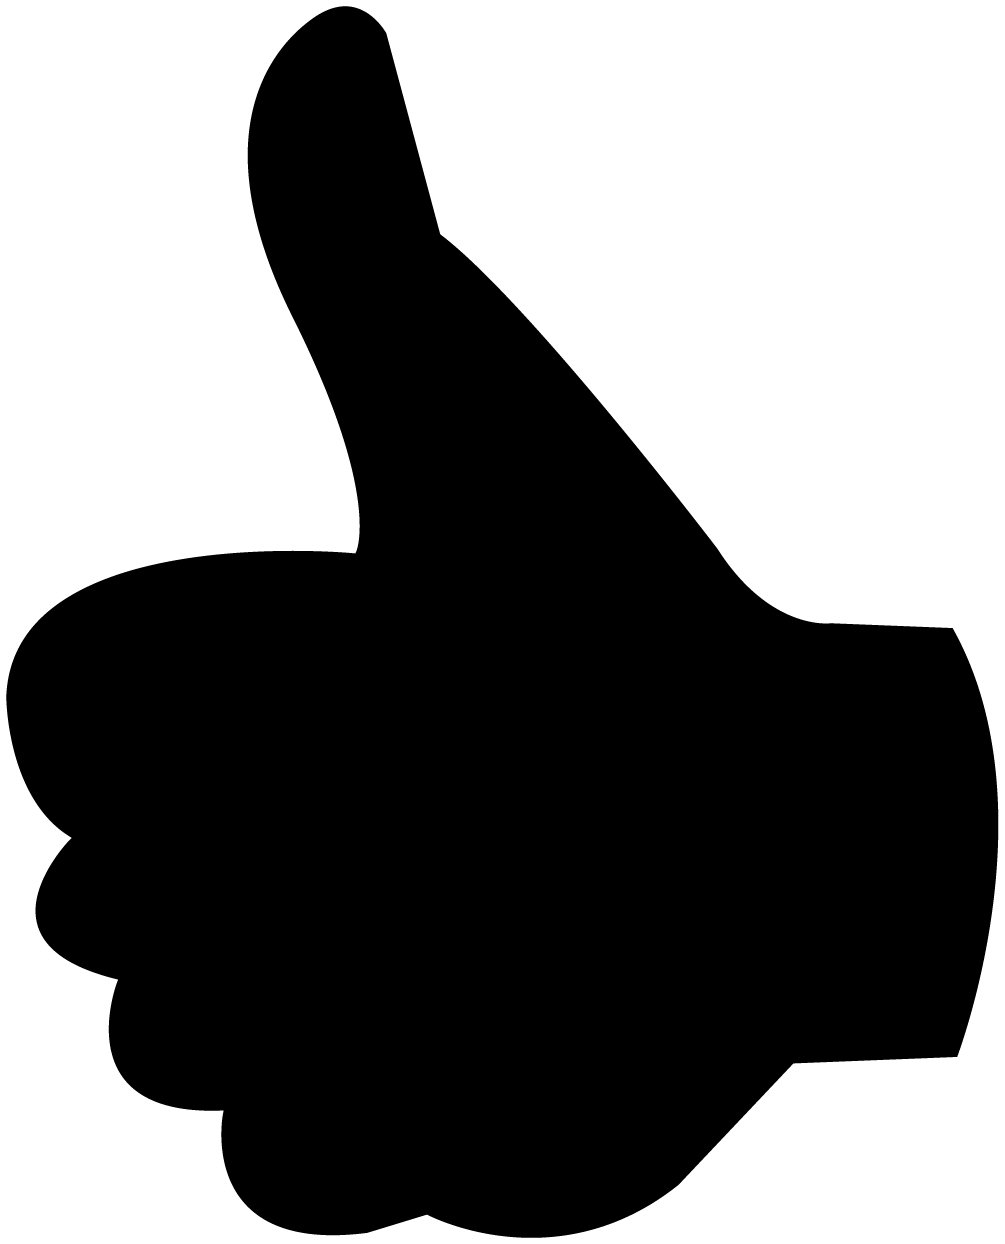 Clipart logo thumbs up svg stock Logo Thumbs Up Clip art of Thumbs Up Clipart #1538 — Clipartwork svg stock